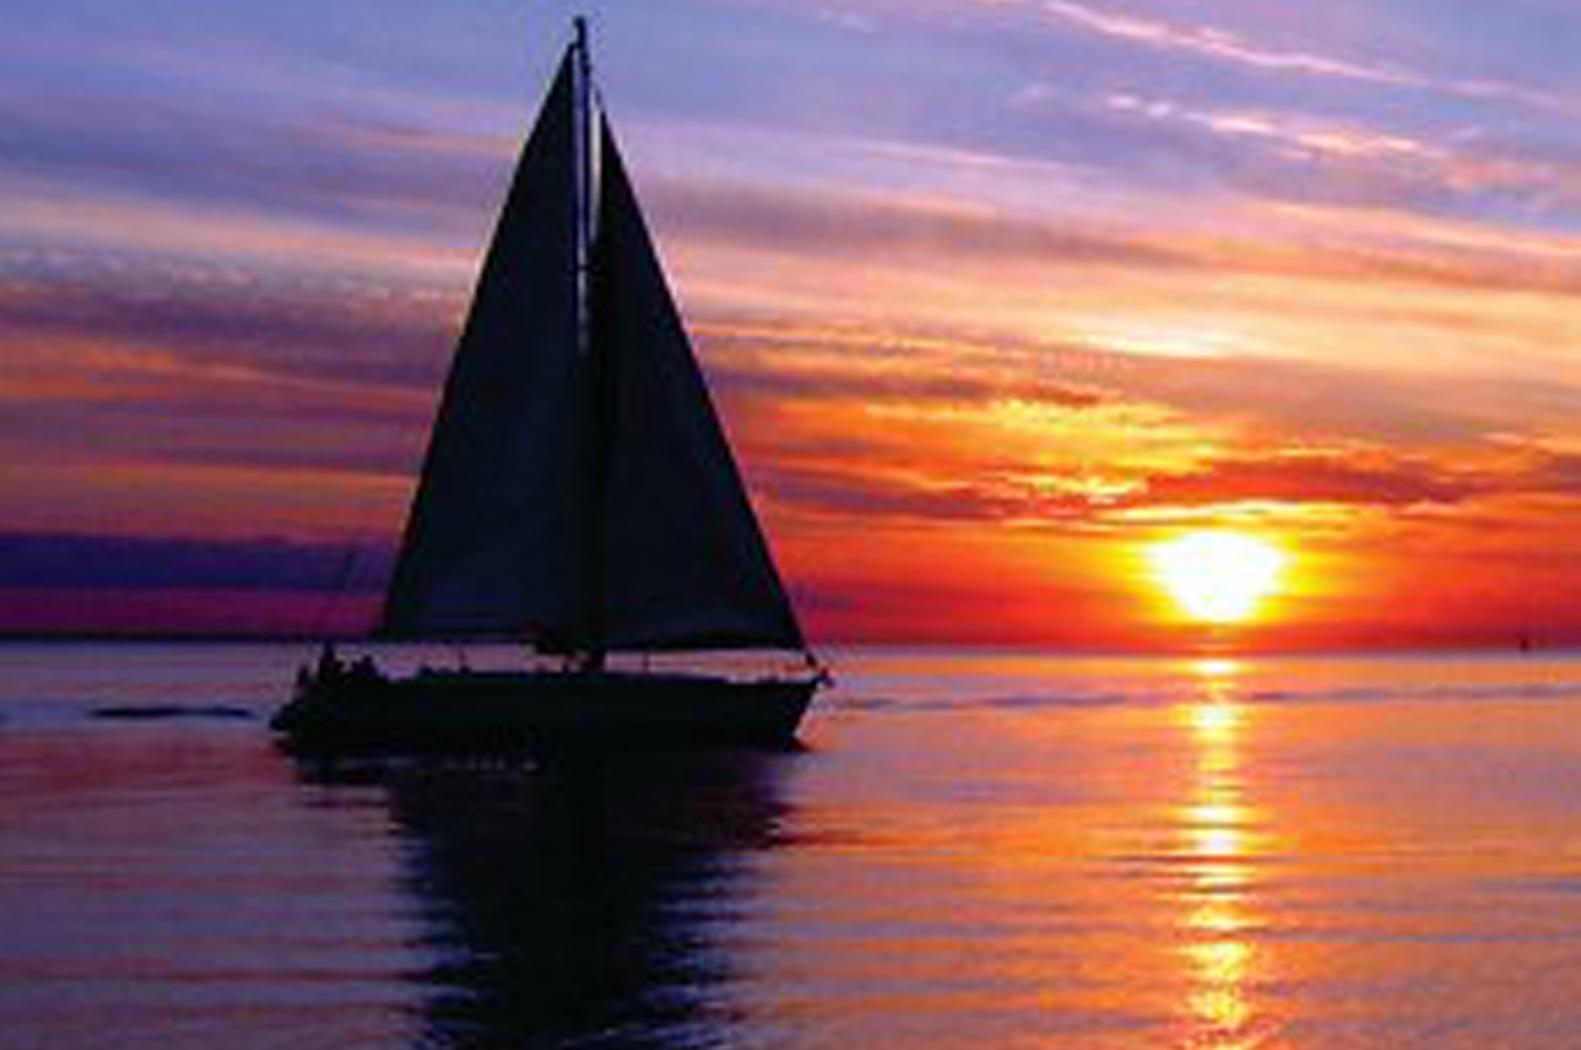 Sunset Dinner Crouse Bahamas